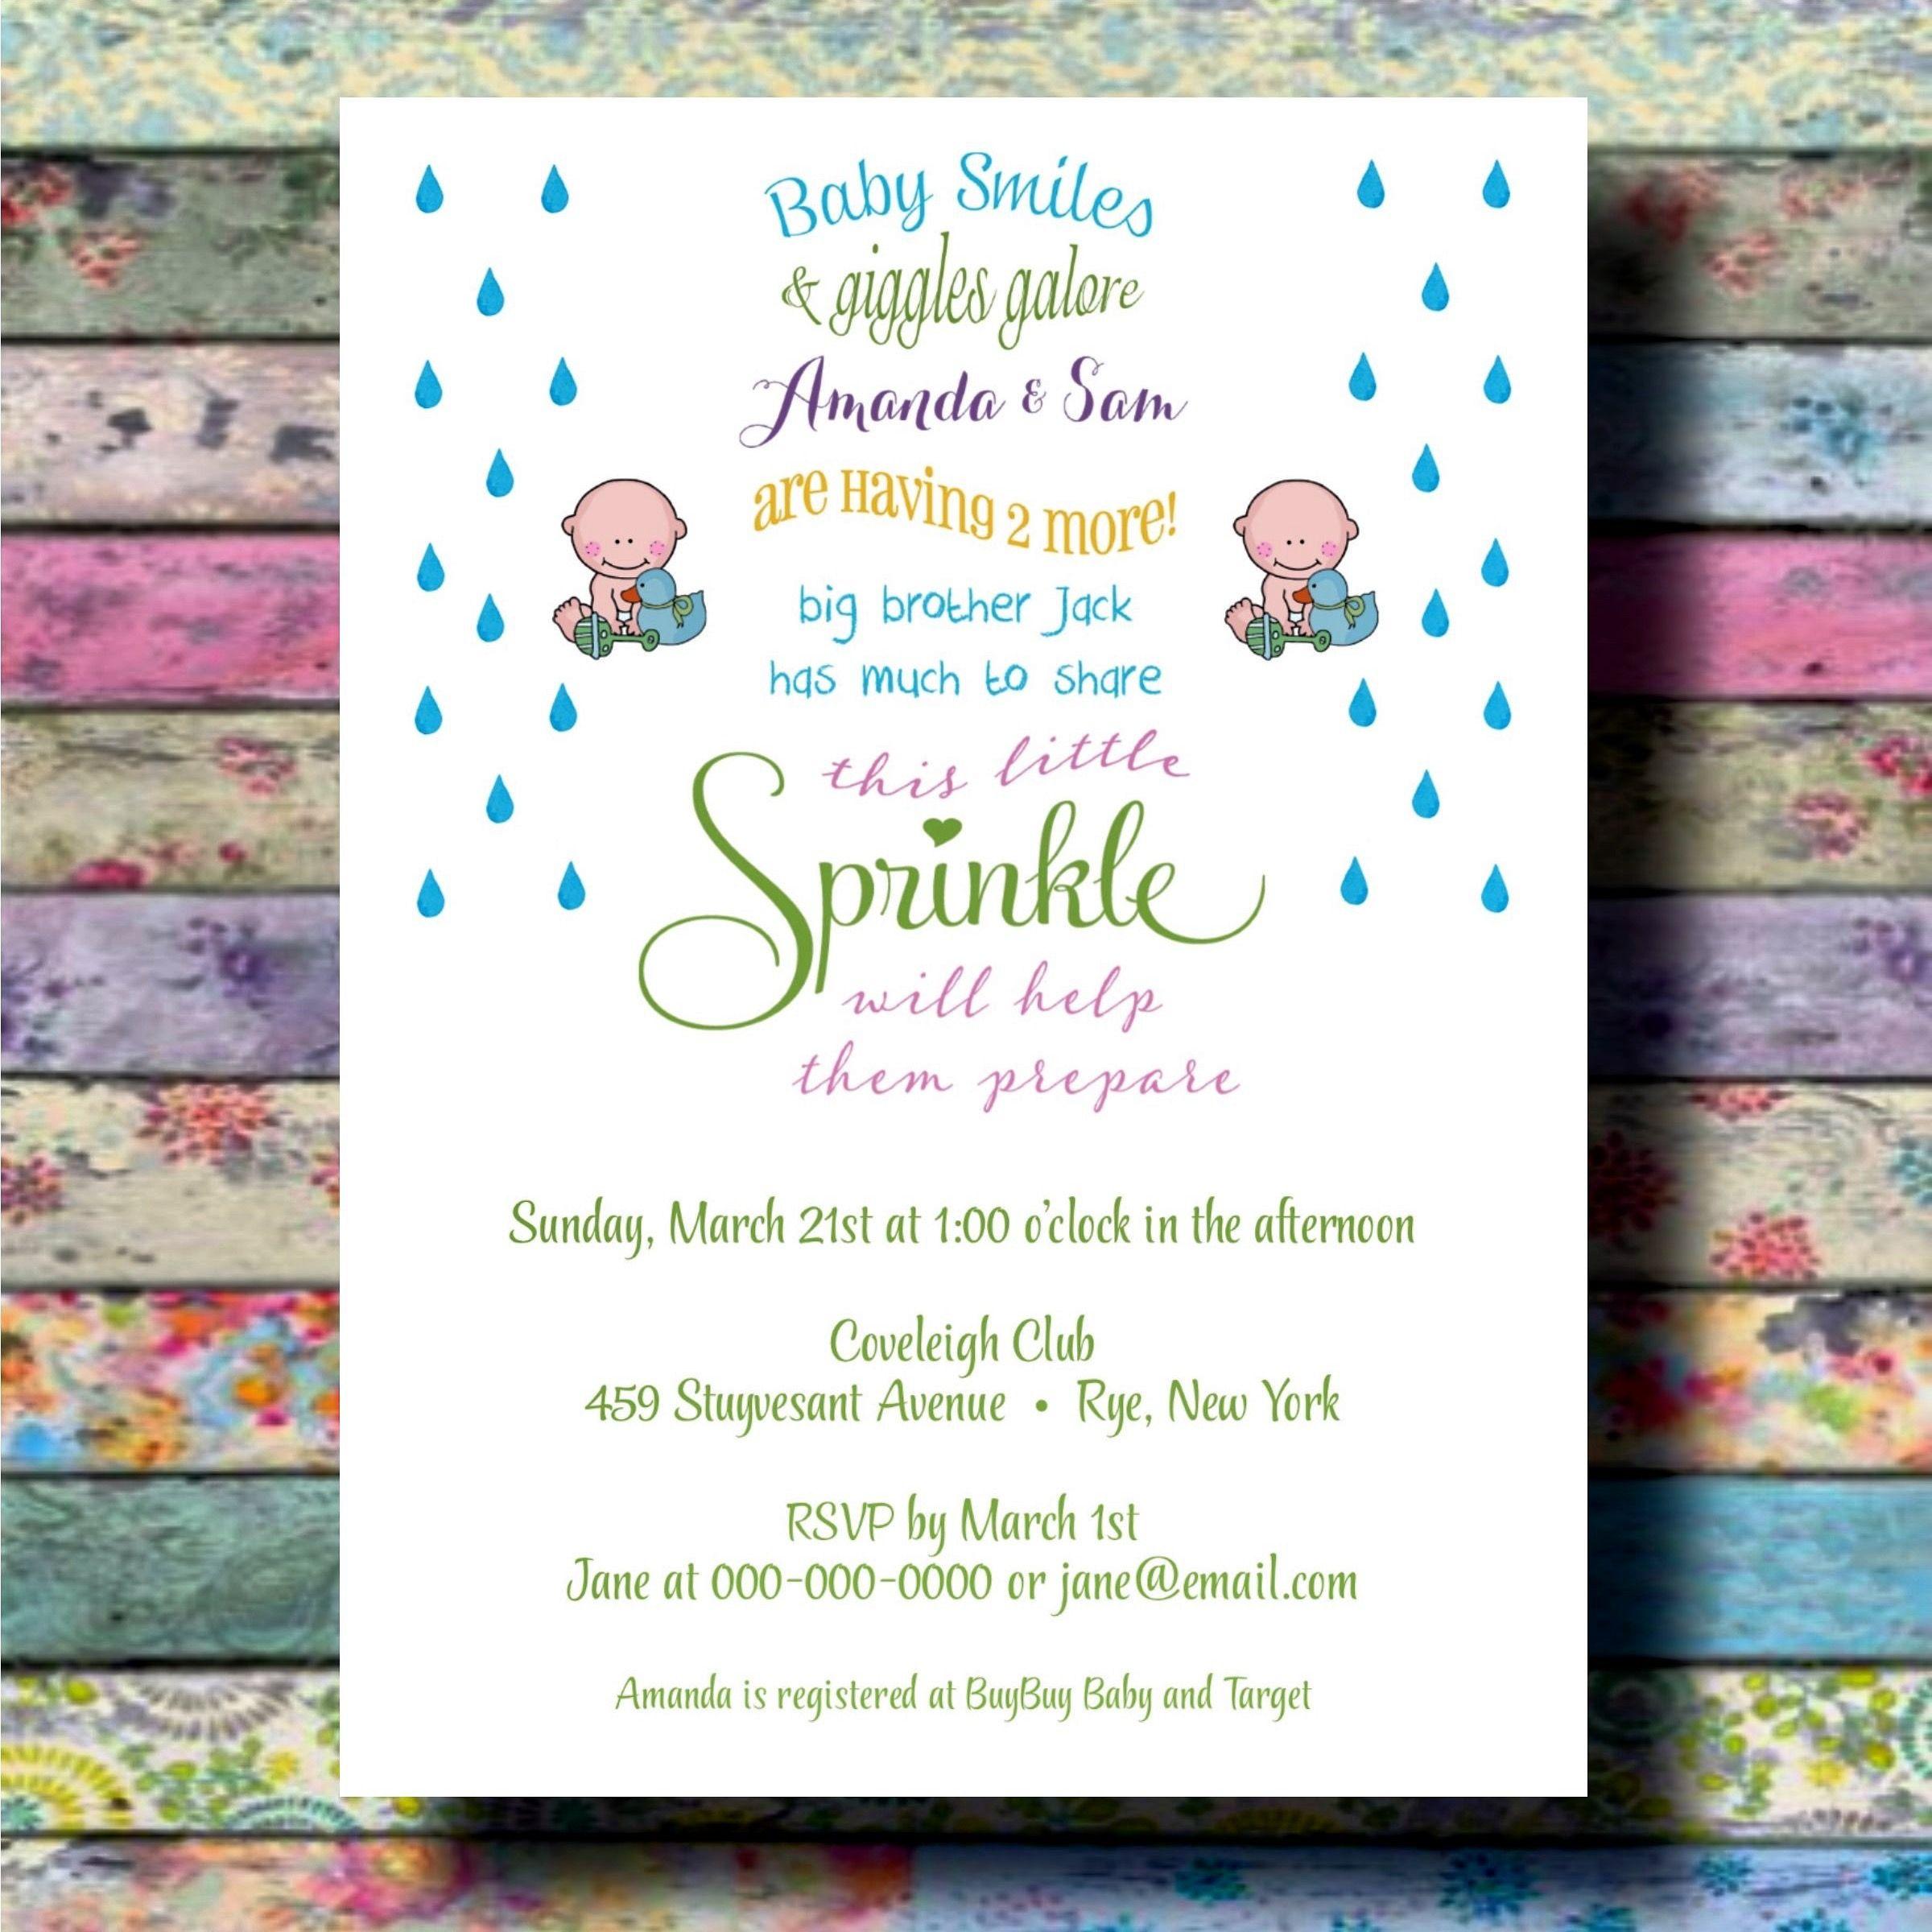 Sprinkle Baby Shower Invitations notesbydiane.com